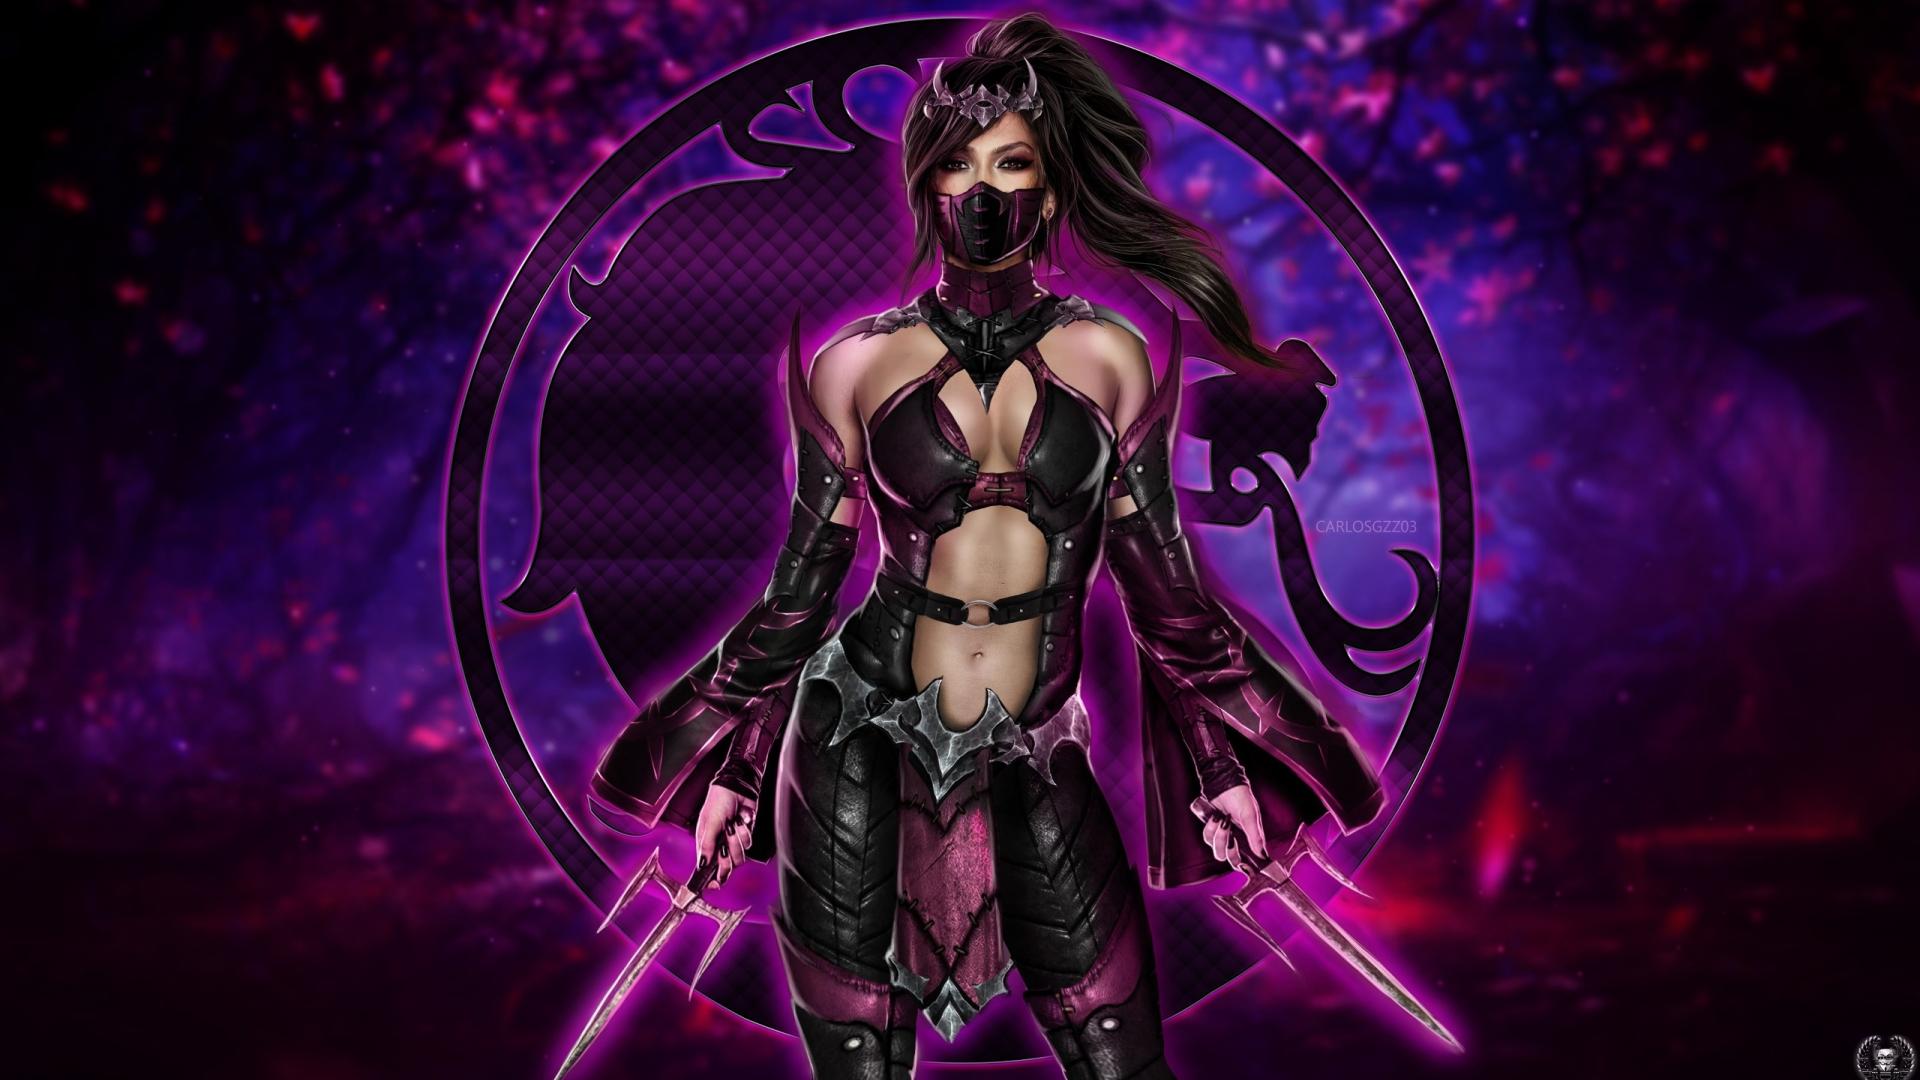 Free Download Mileena Mortal Kombat 11 Wallpaper Hd Games 4k